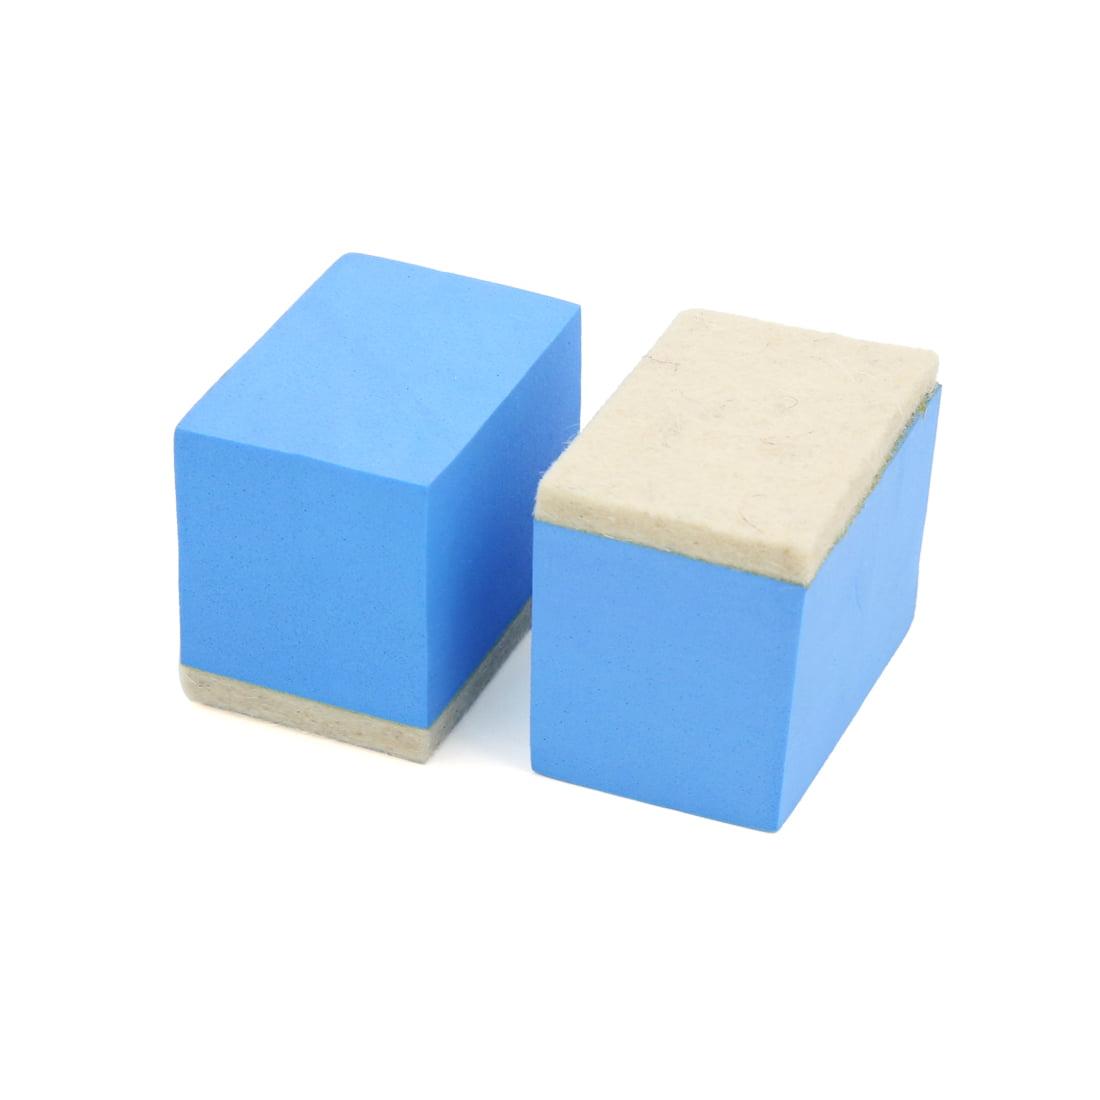 2Pcs Blue Beige Sponge  Car Vehicle Polishing Pad Waxing Buffing Tool - image 2 of 2